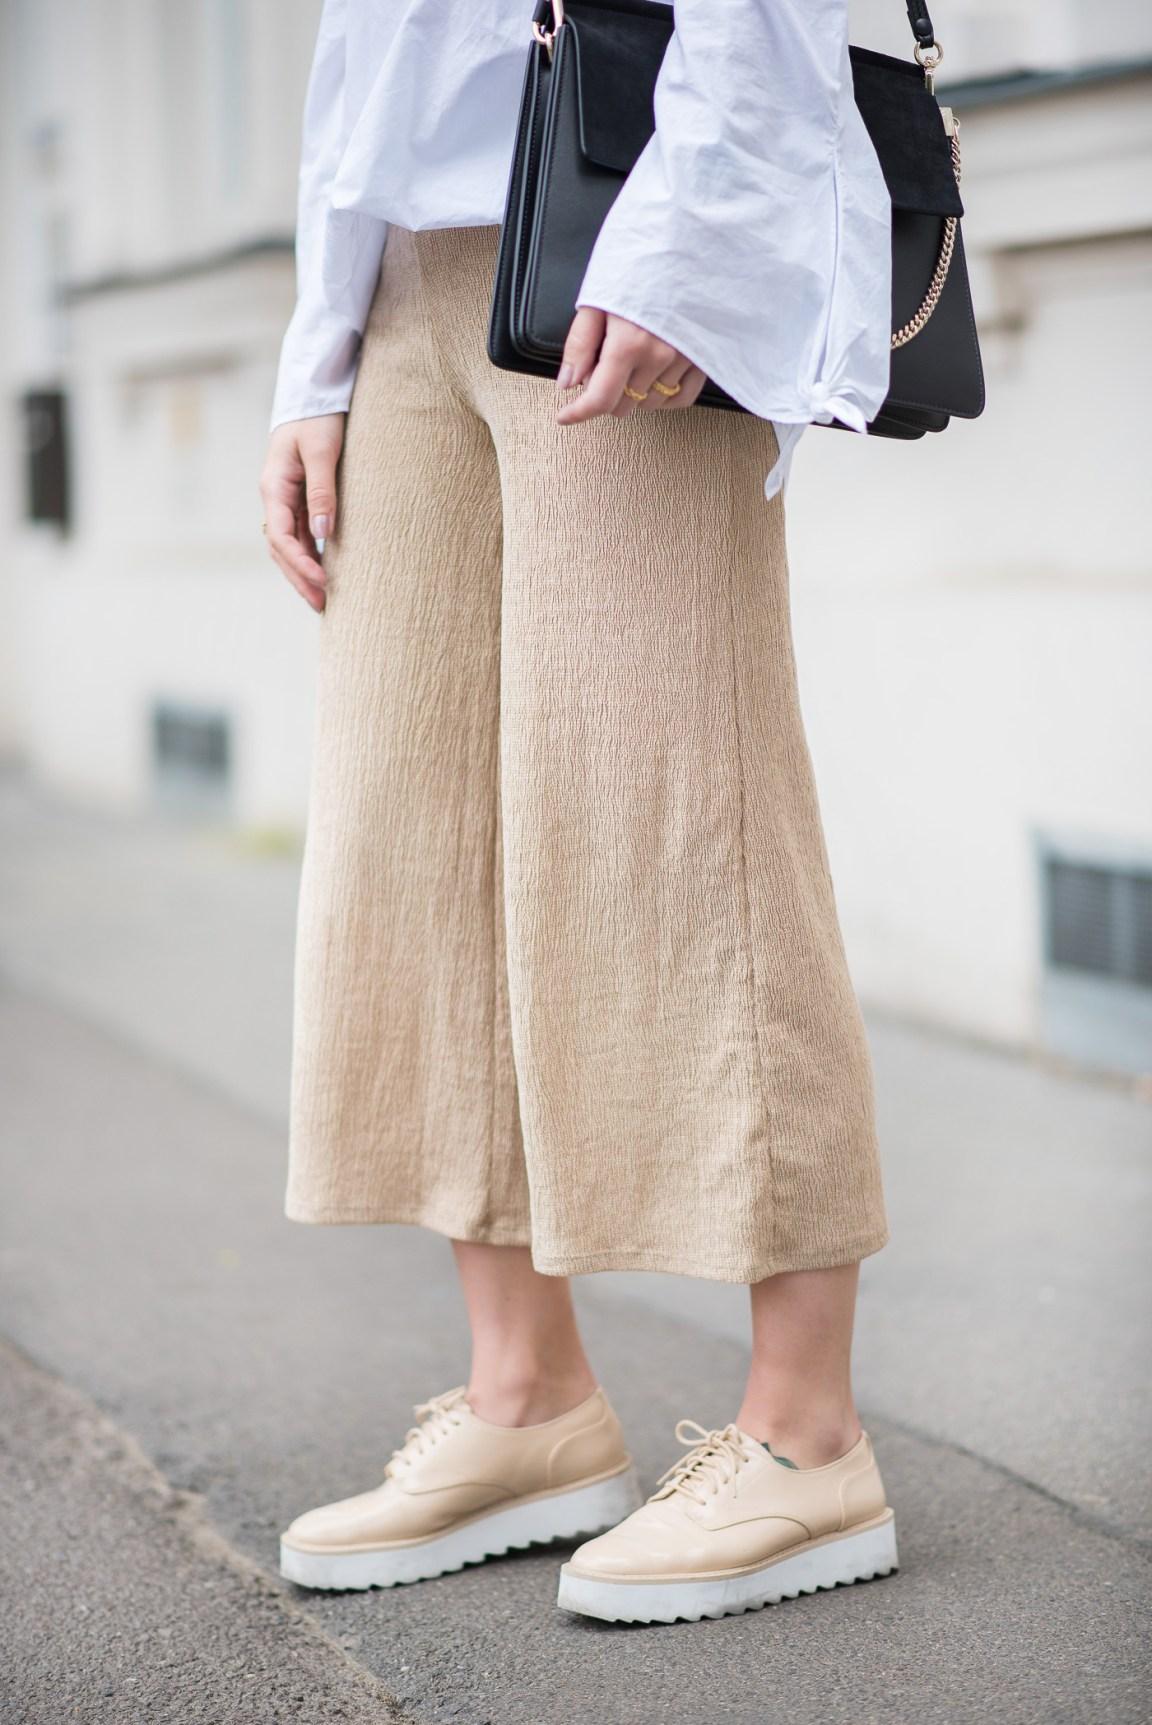 Culotte_&_Platforms_Outfit_5